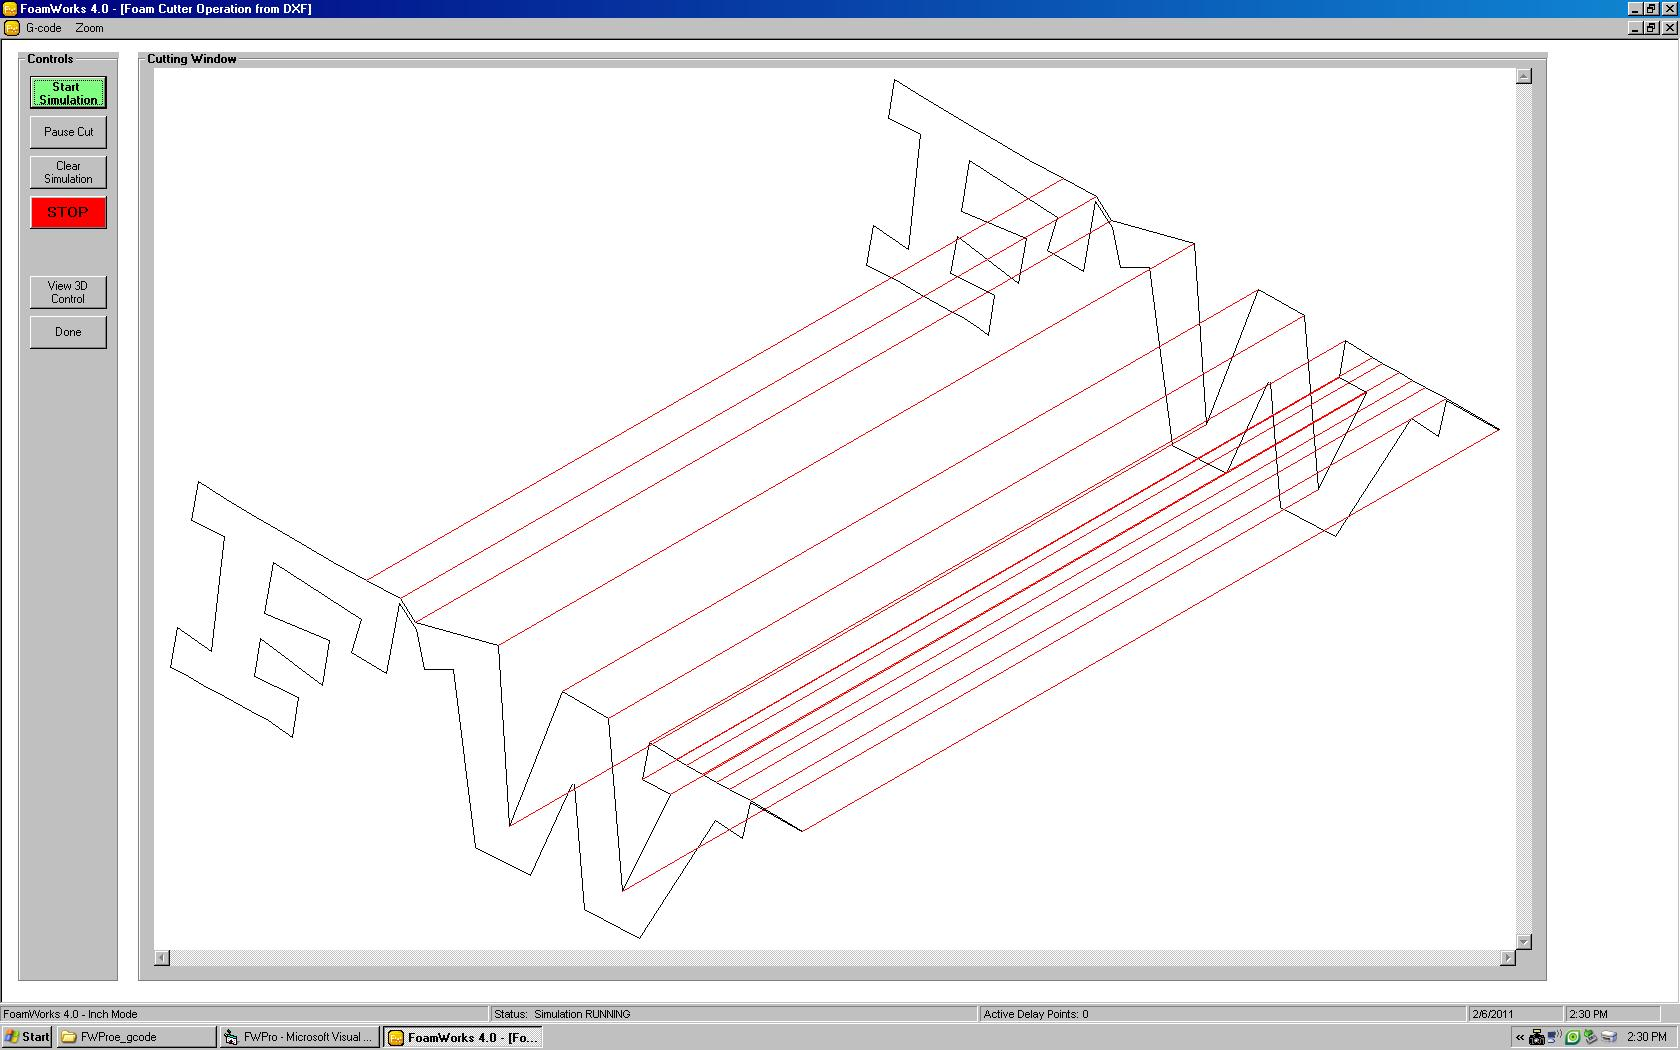 hight resolution of foamworks 4 0 cut simulation foamworks 4 0 foamworks 4 0 cut simulation hot wire foam cutter design diagram